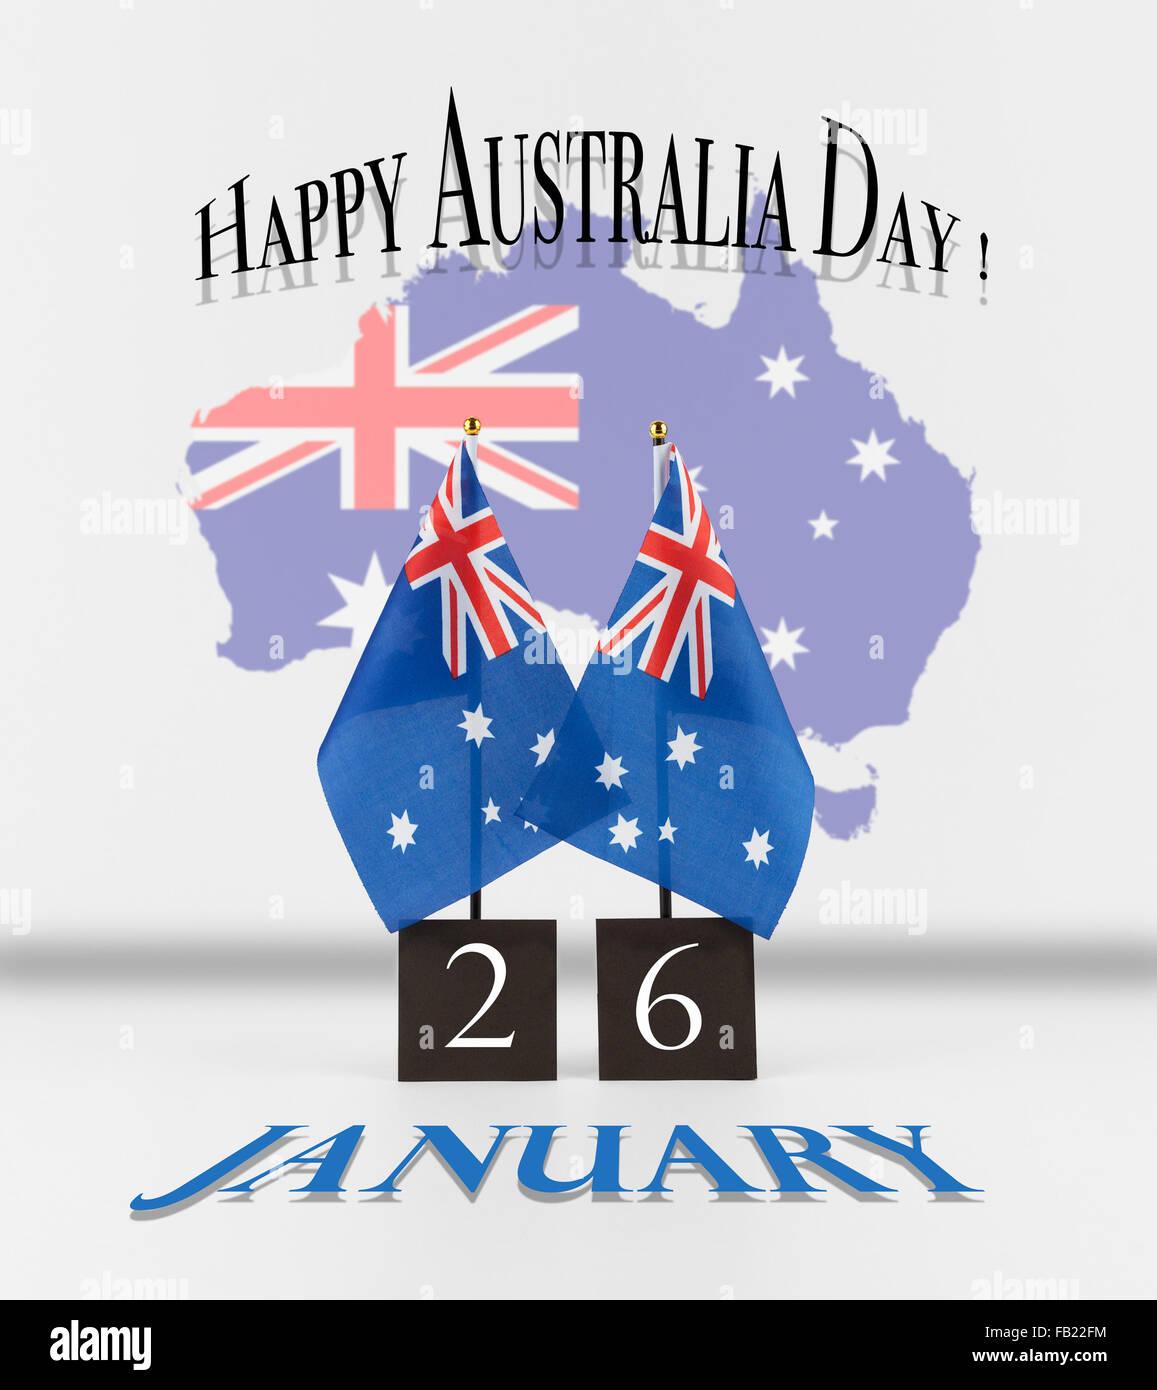 Australia day greetings two australian table flags with date and australia day greetings two australian table flags with date and map of australia australian national symbols isolated on whit m4hsunfo